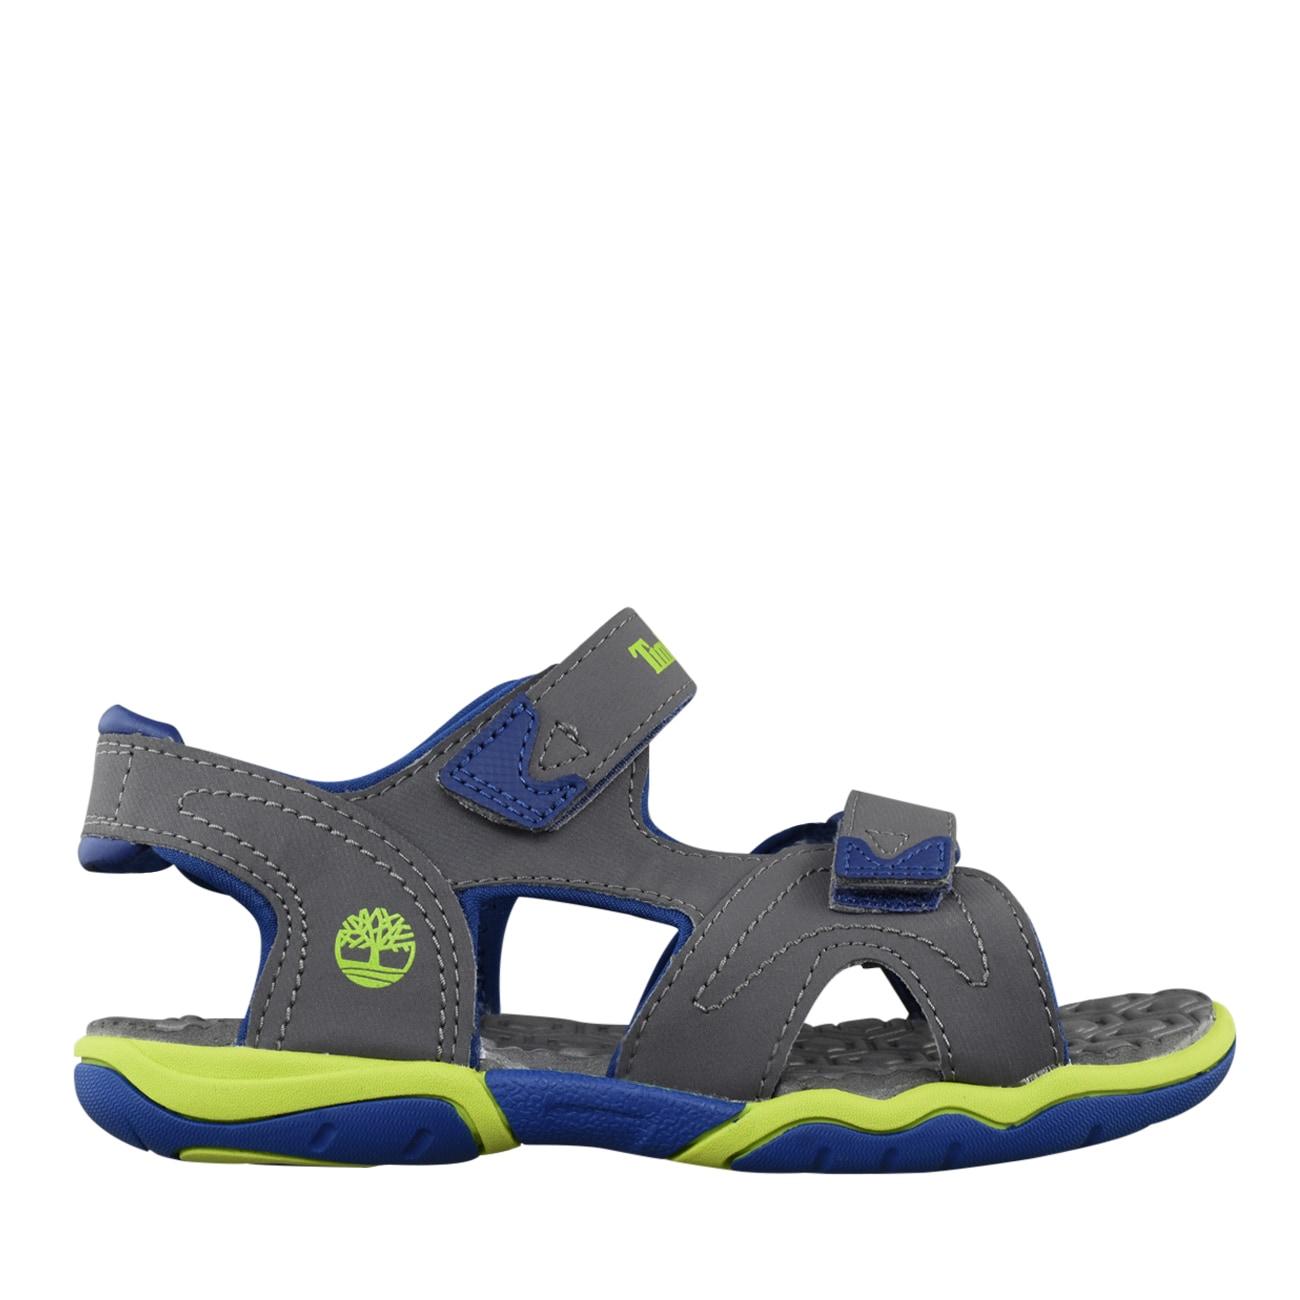 Timberland Youth Boy S Adventure Seeker Sandal The Shoe